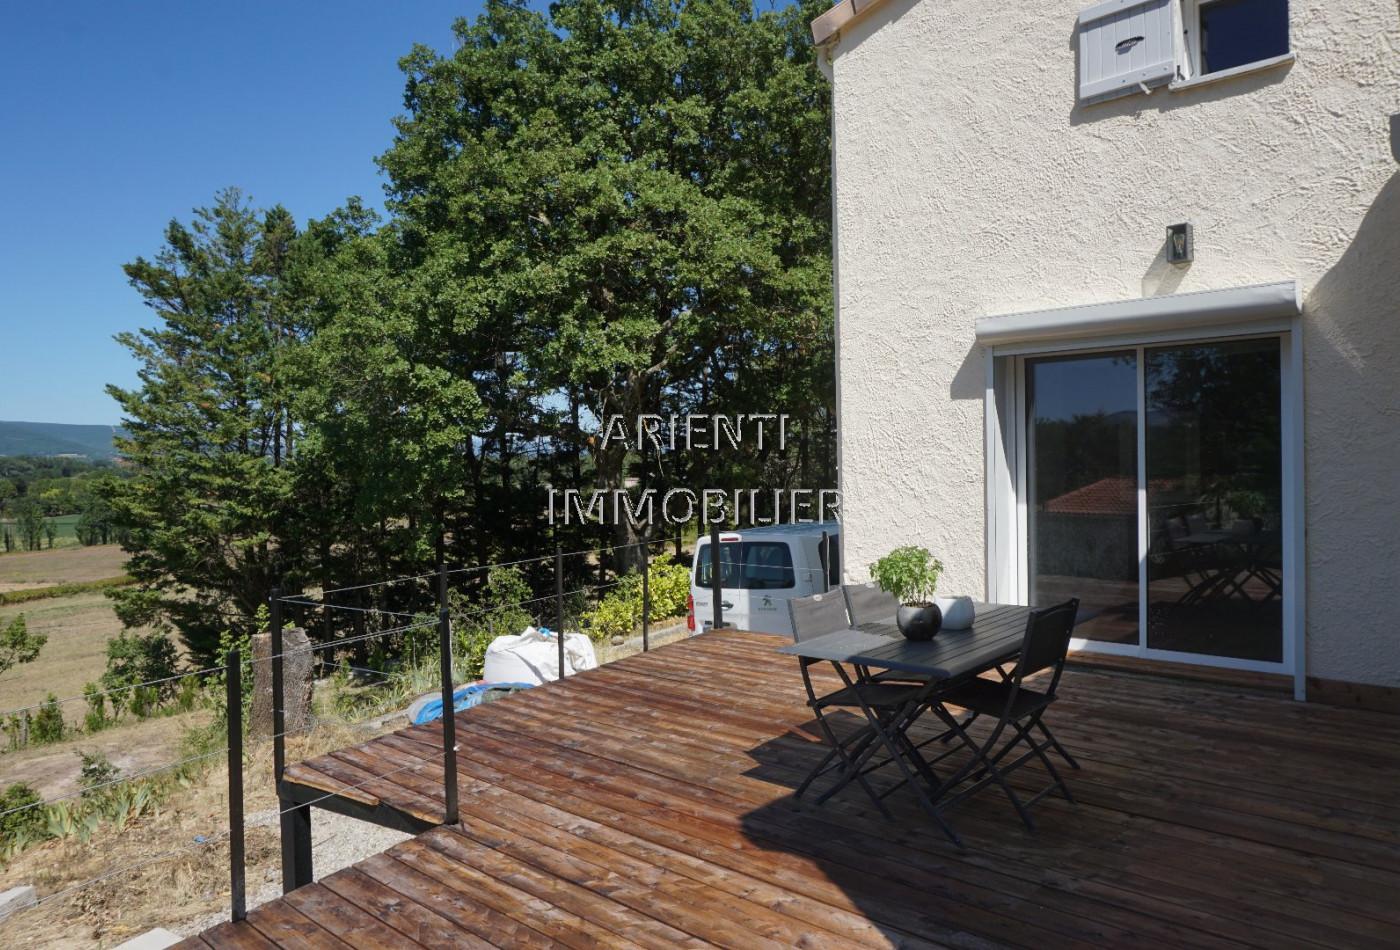 A vendre Montelimar 260013171 Office immobilier arienti